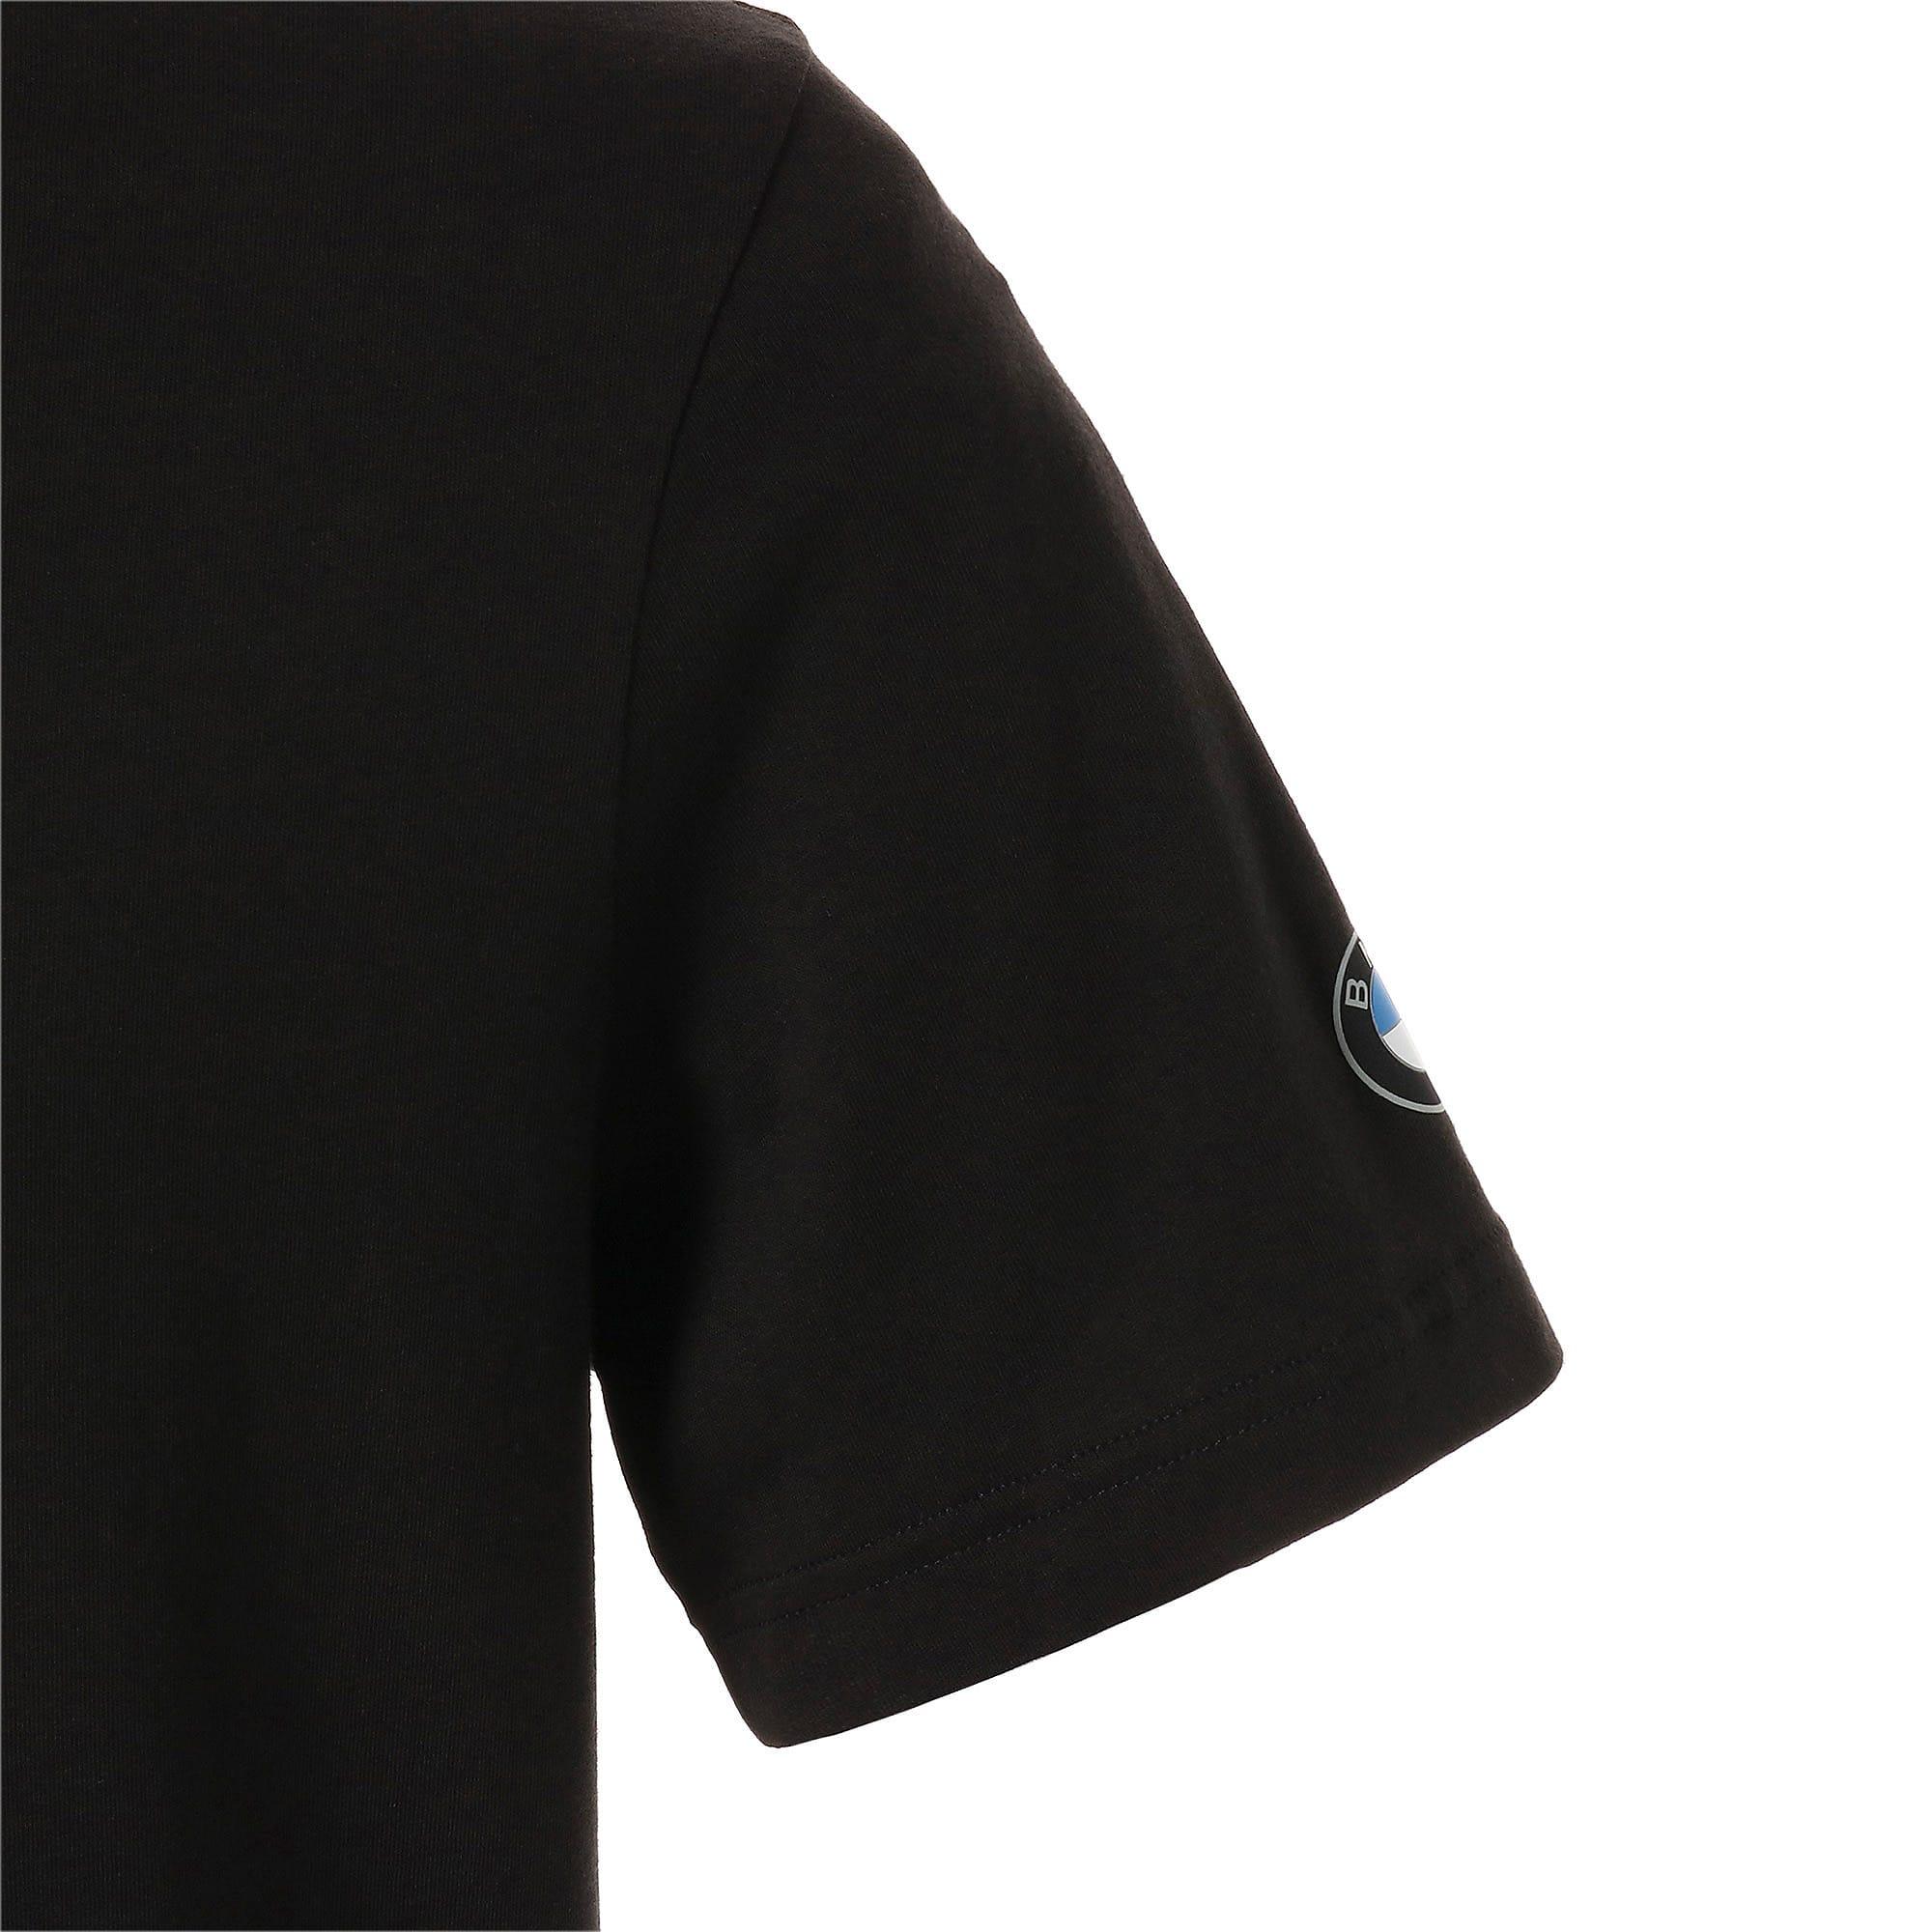 Thumbnail 8 of BMW MMS ロゴ Tシャツ +, Puma Black, medium-JPN